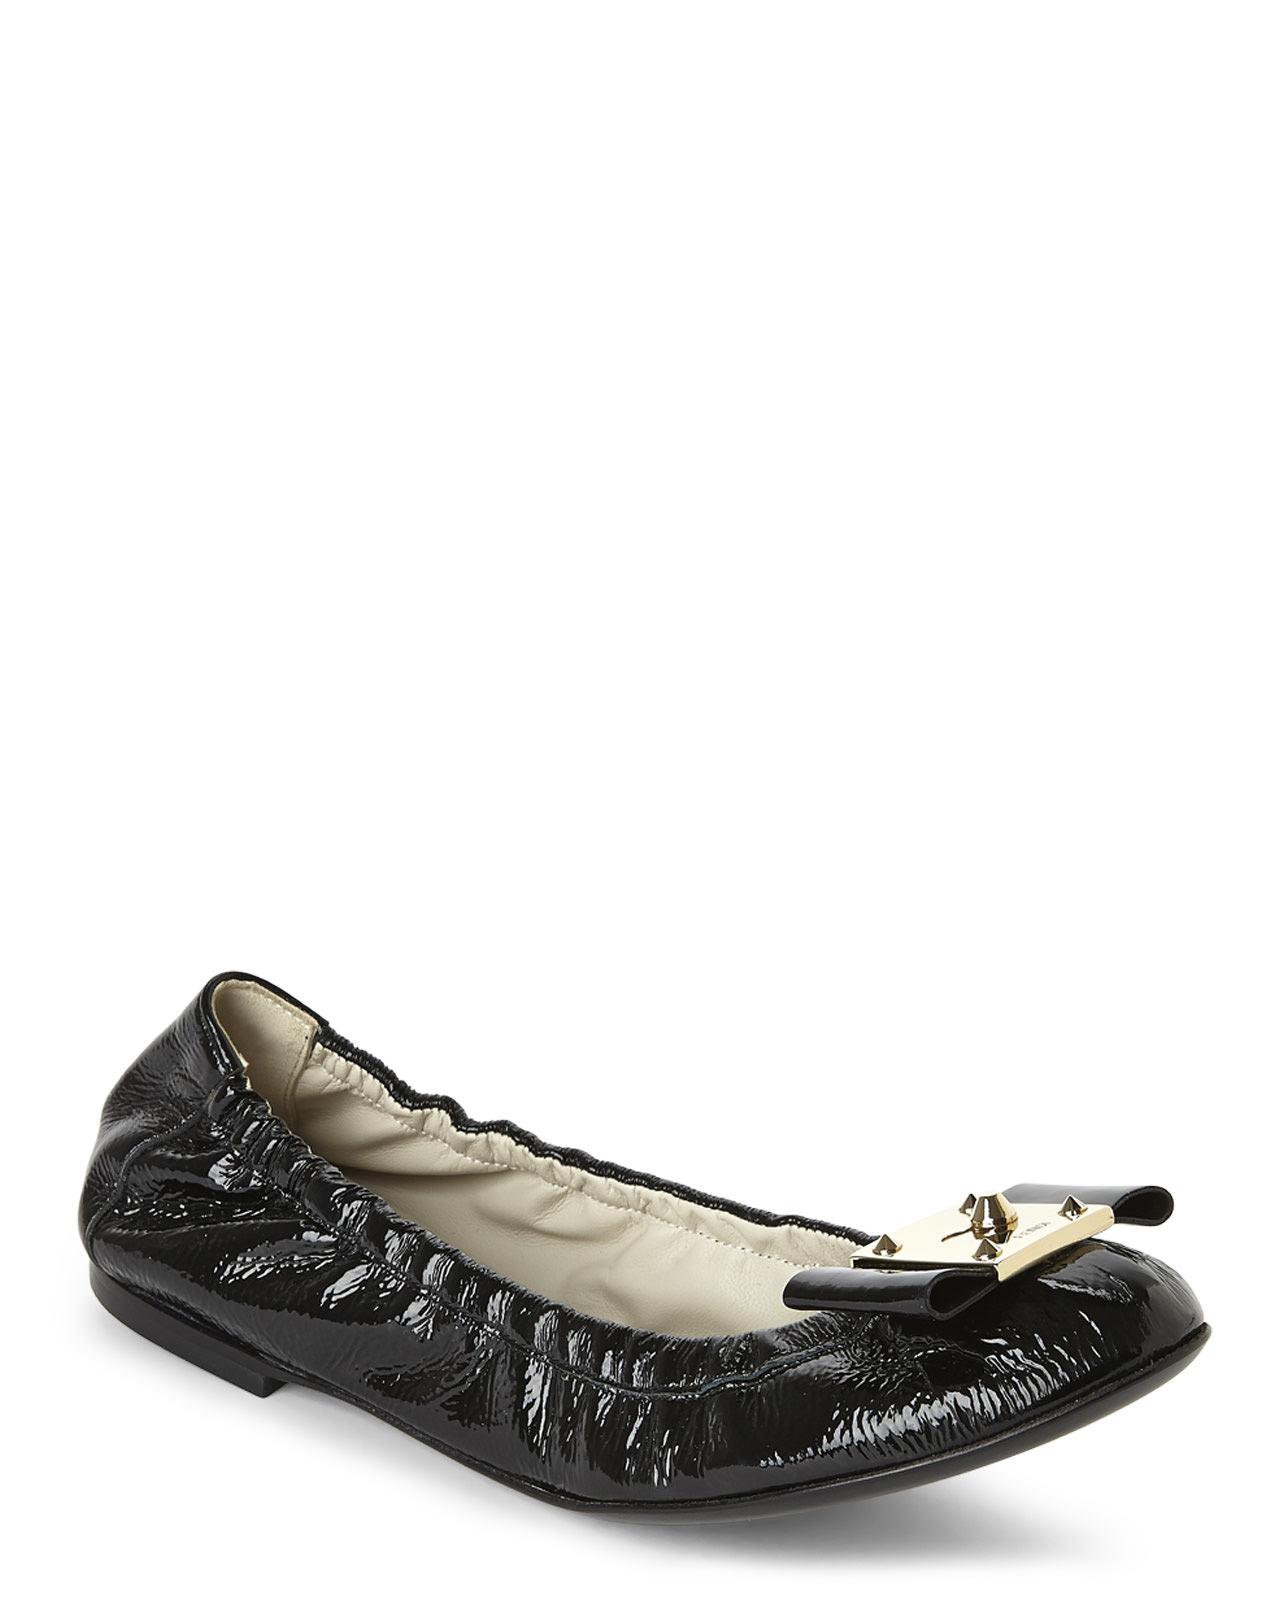 a2baf6e3ea3d0 Fendi Black Bow-Accented Ballerina Flats in Black - Lyst